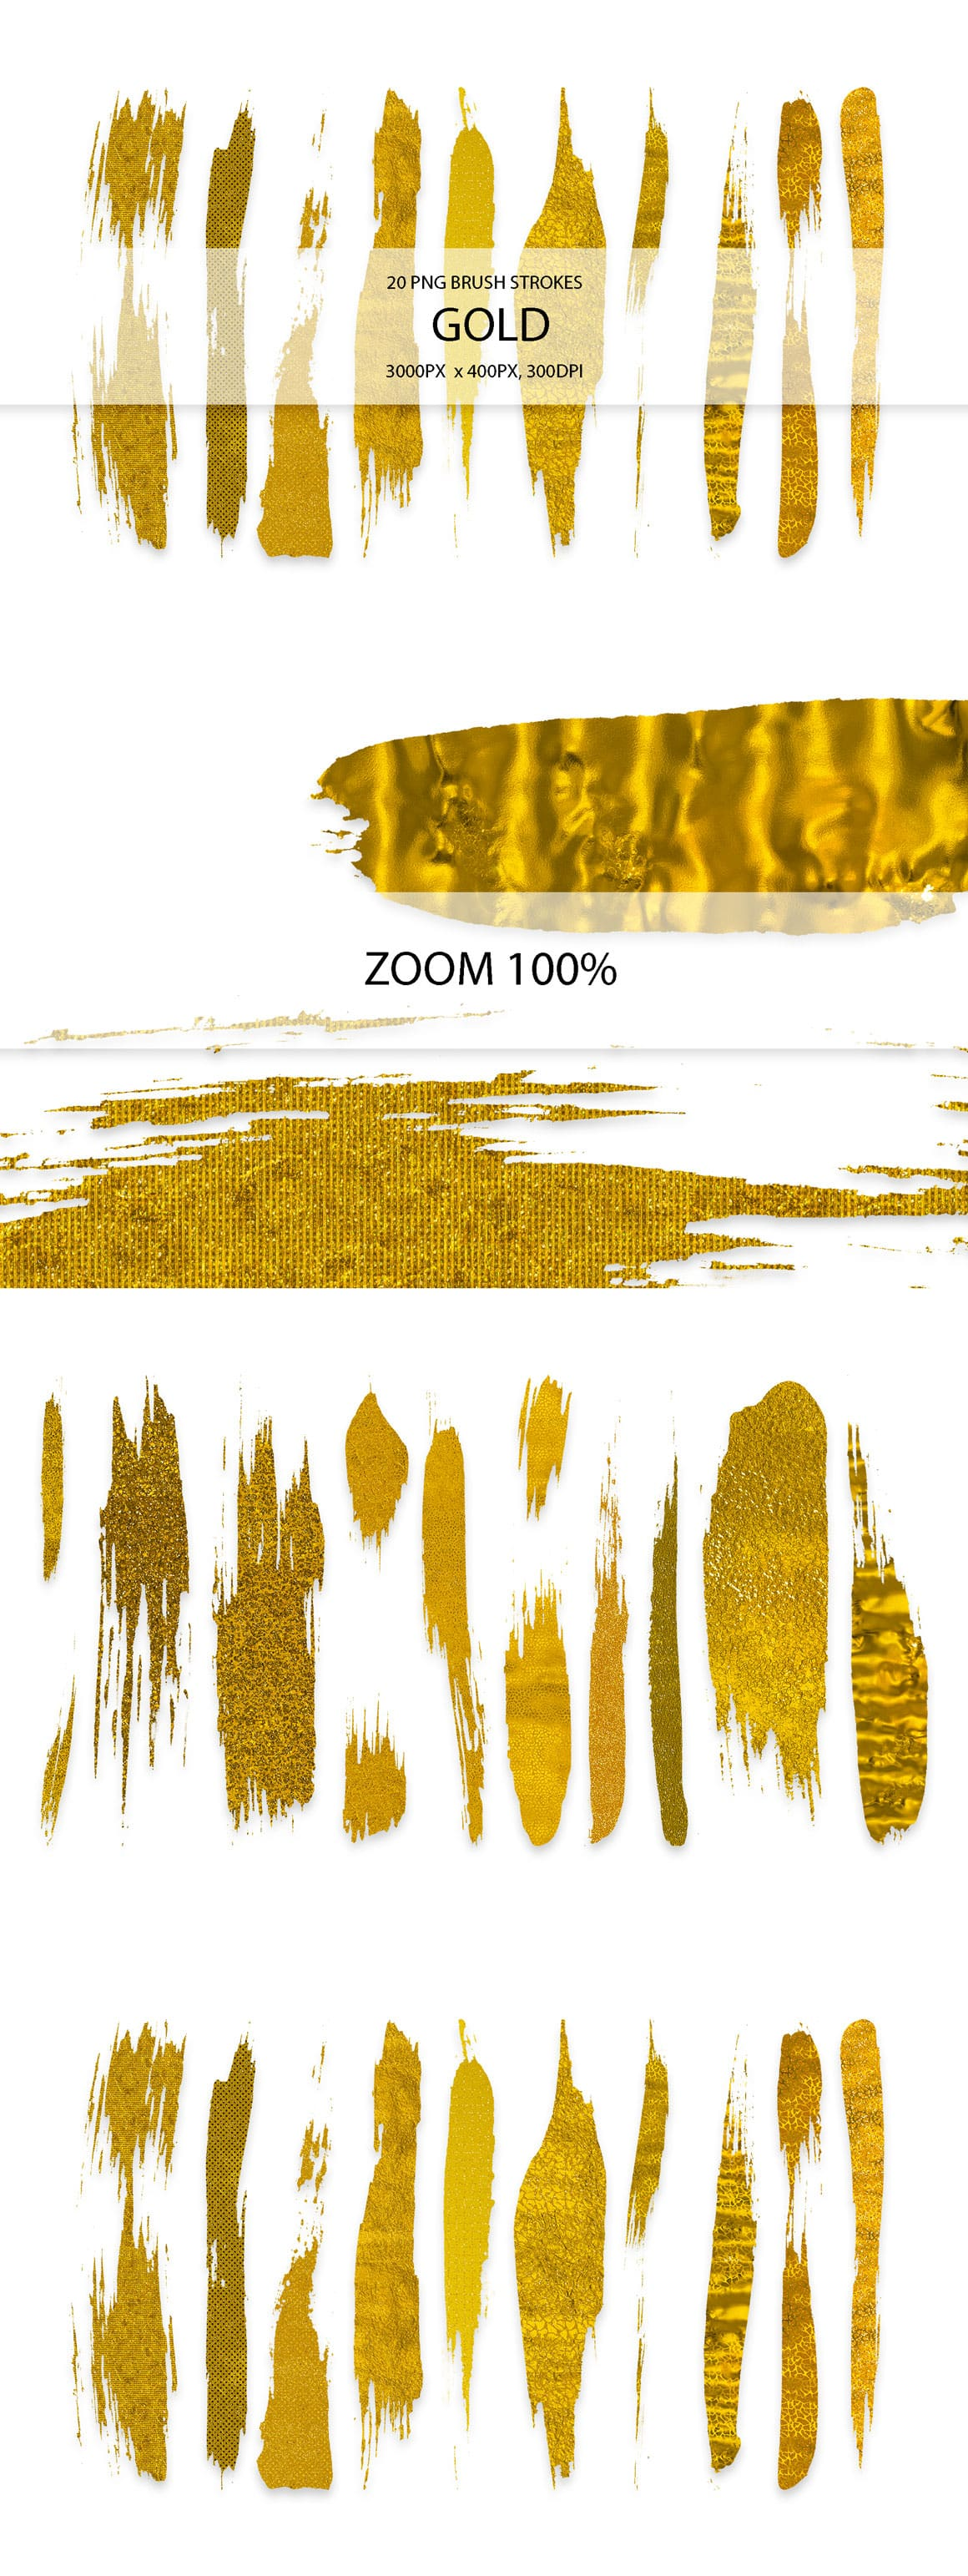 829 Acrylic Brush Strokes and Digital Brush Strokes - $9 - GoldStrokes 01 min